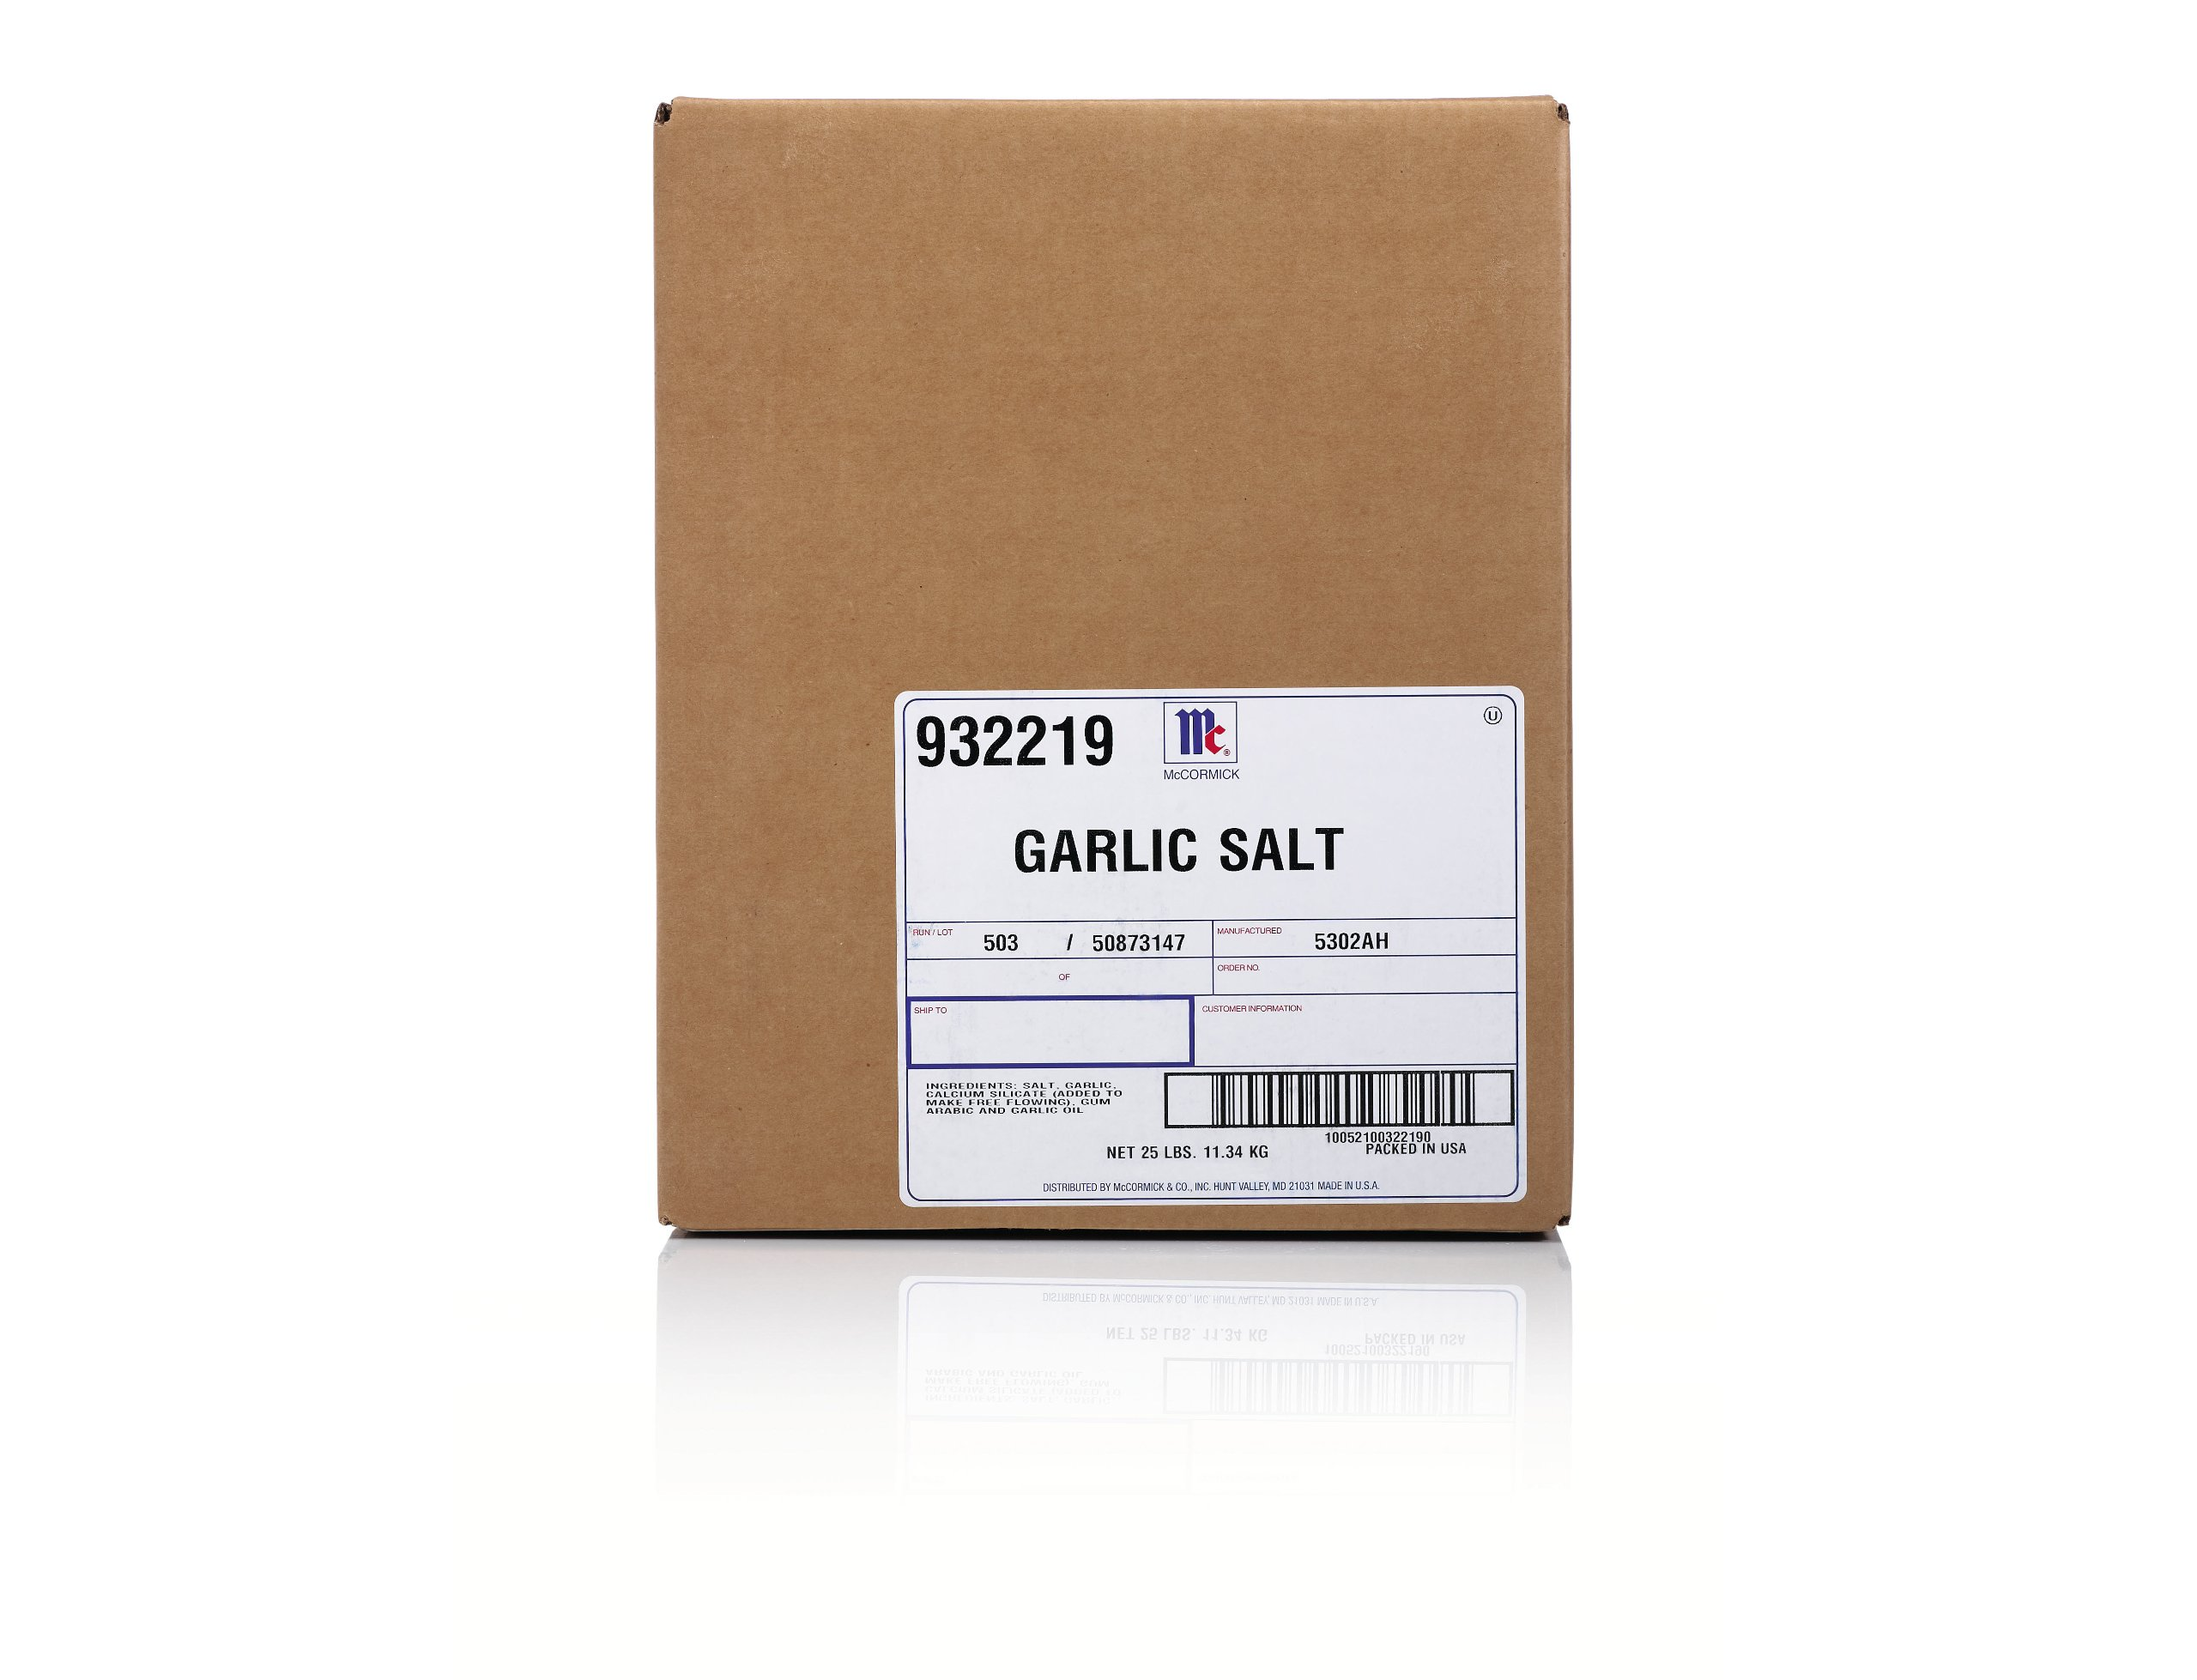 McCormick Culinary Garlic Salt, 25 lbs